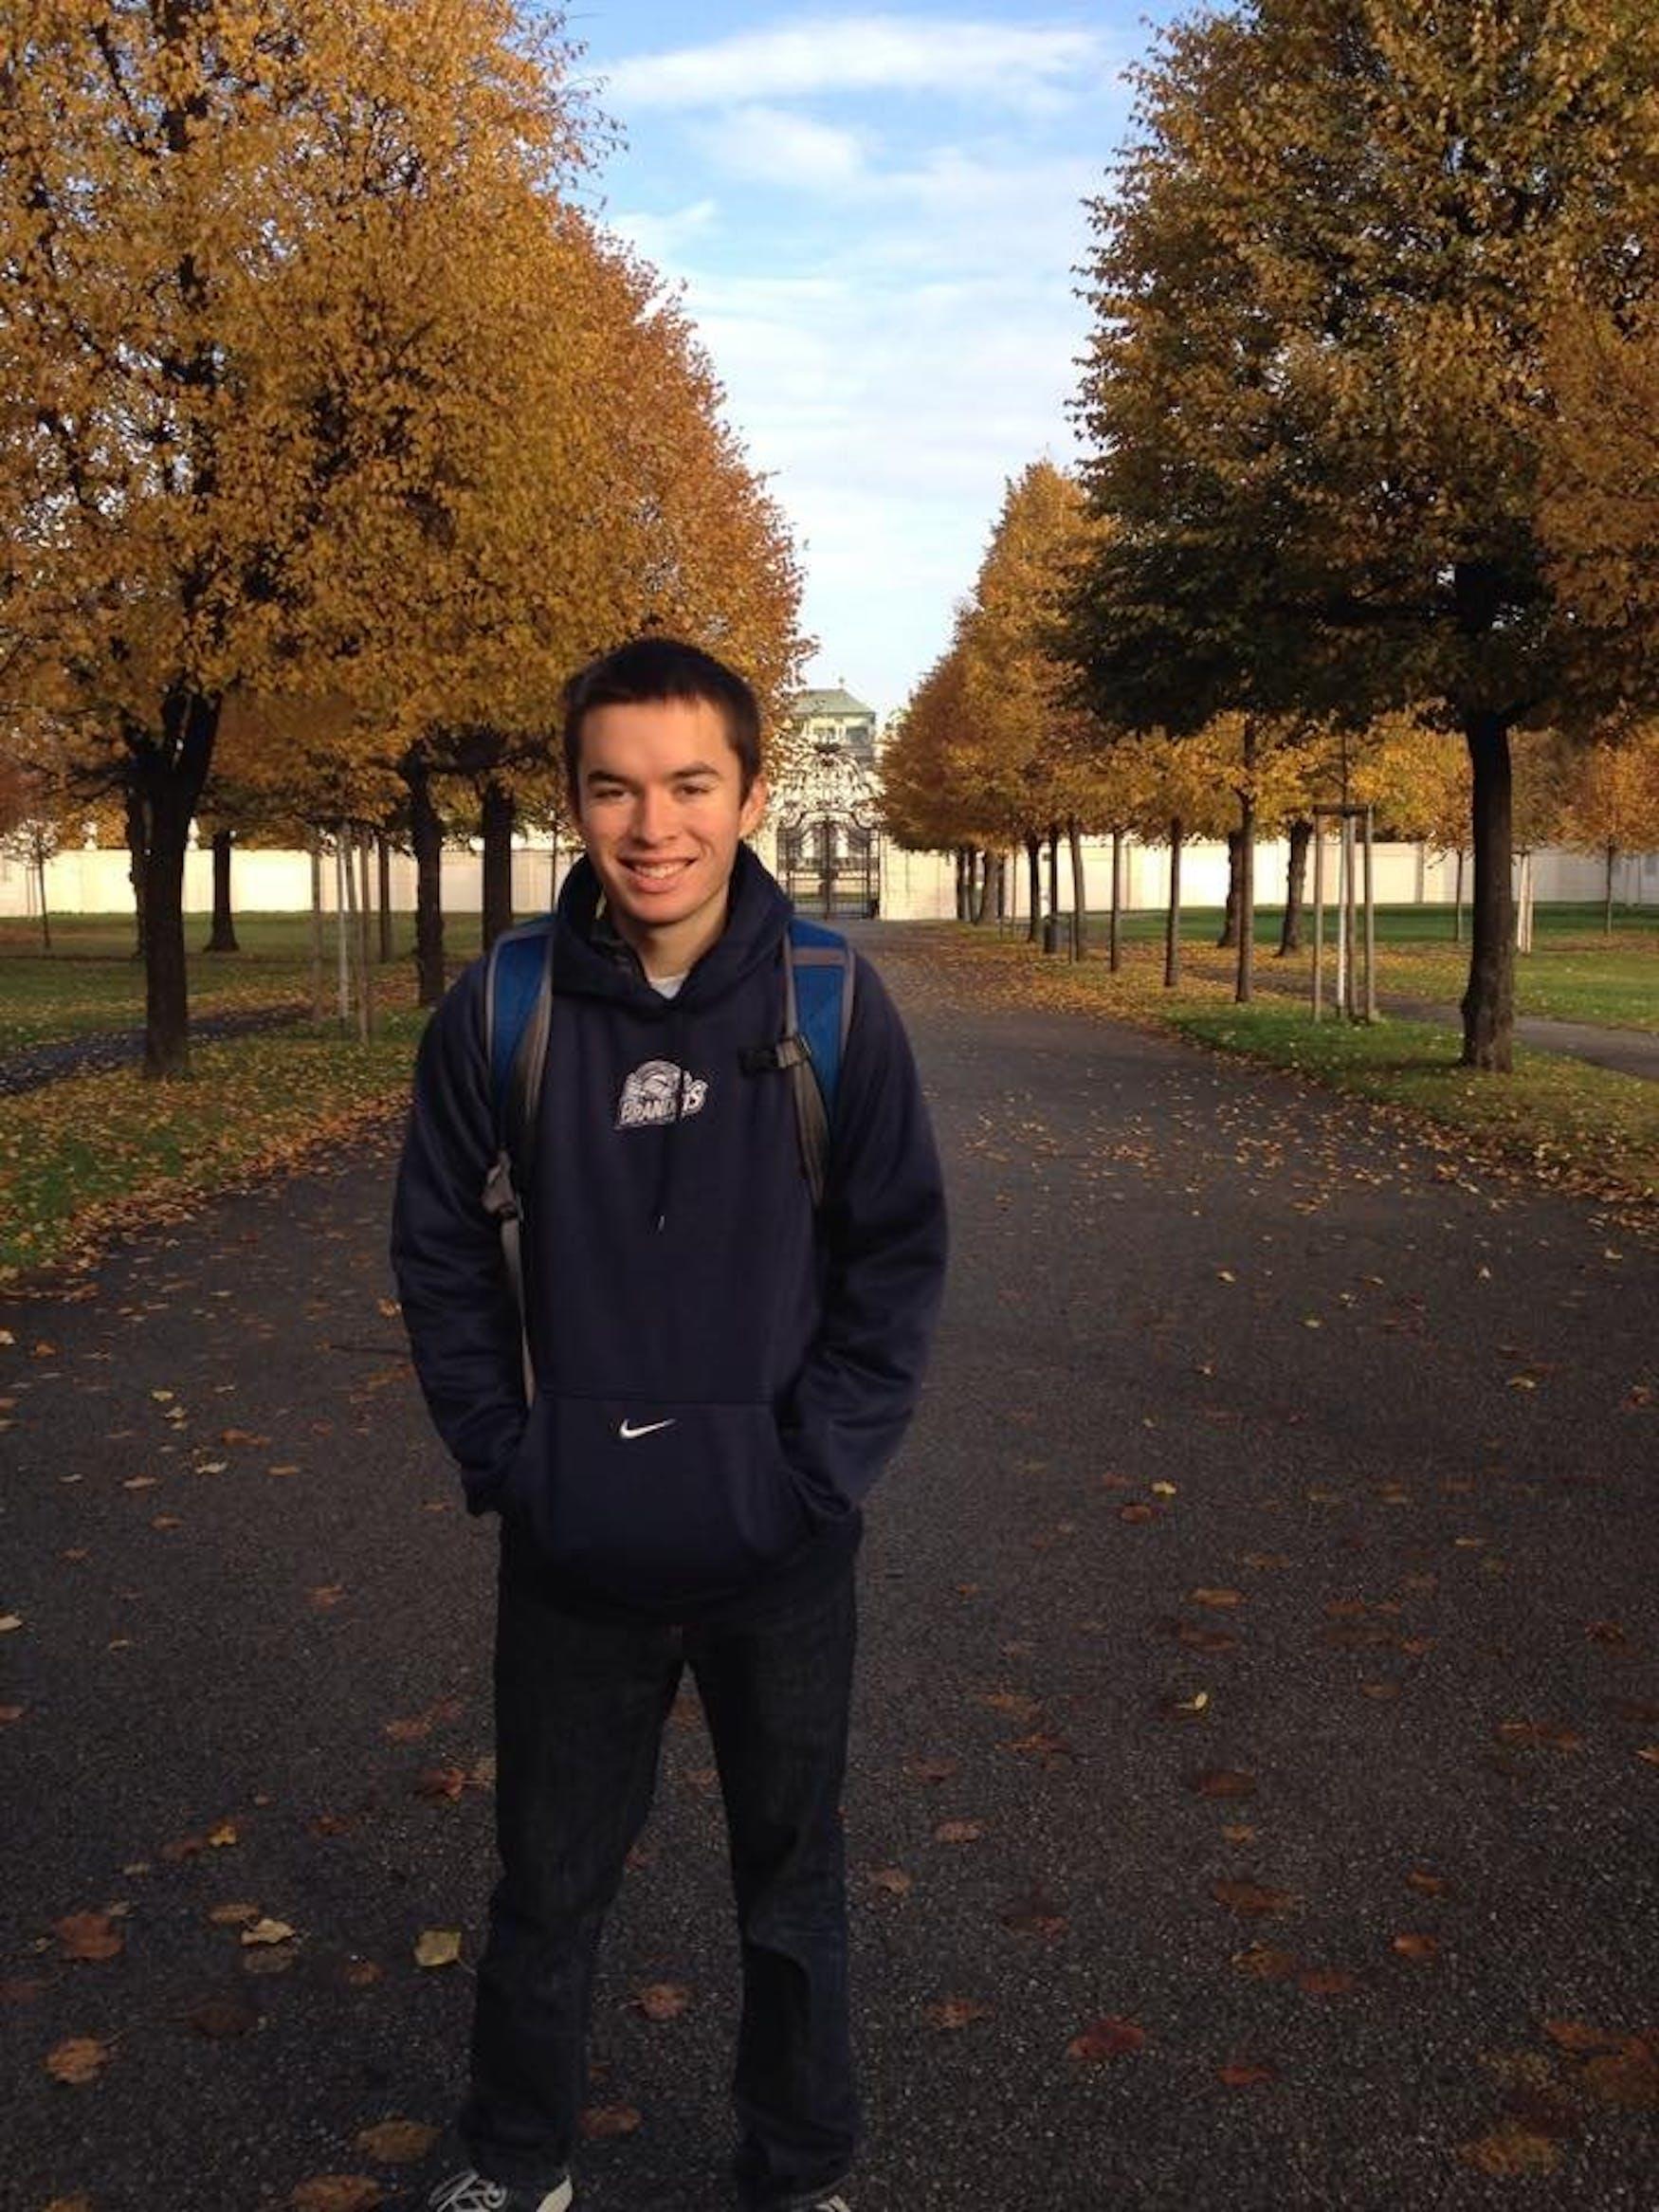 BRANDEIS PRIDE: Dupont shows school spirit by wearing a Brandeis sweatshirt while traveling abroad in Vienna, Austria.